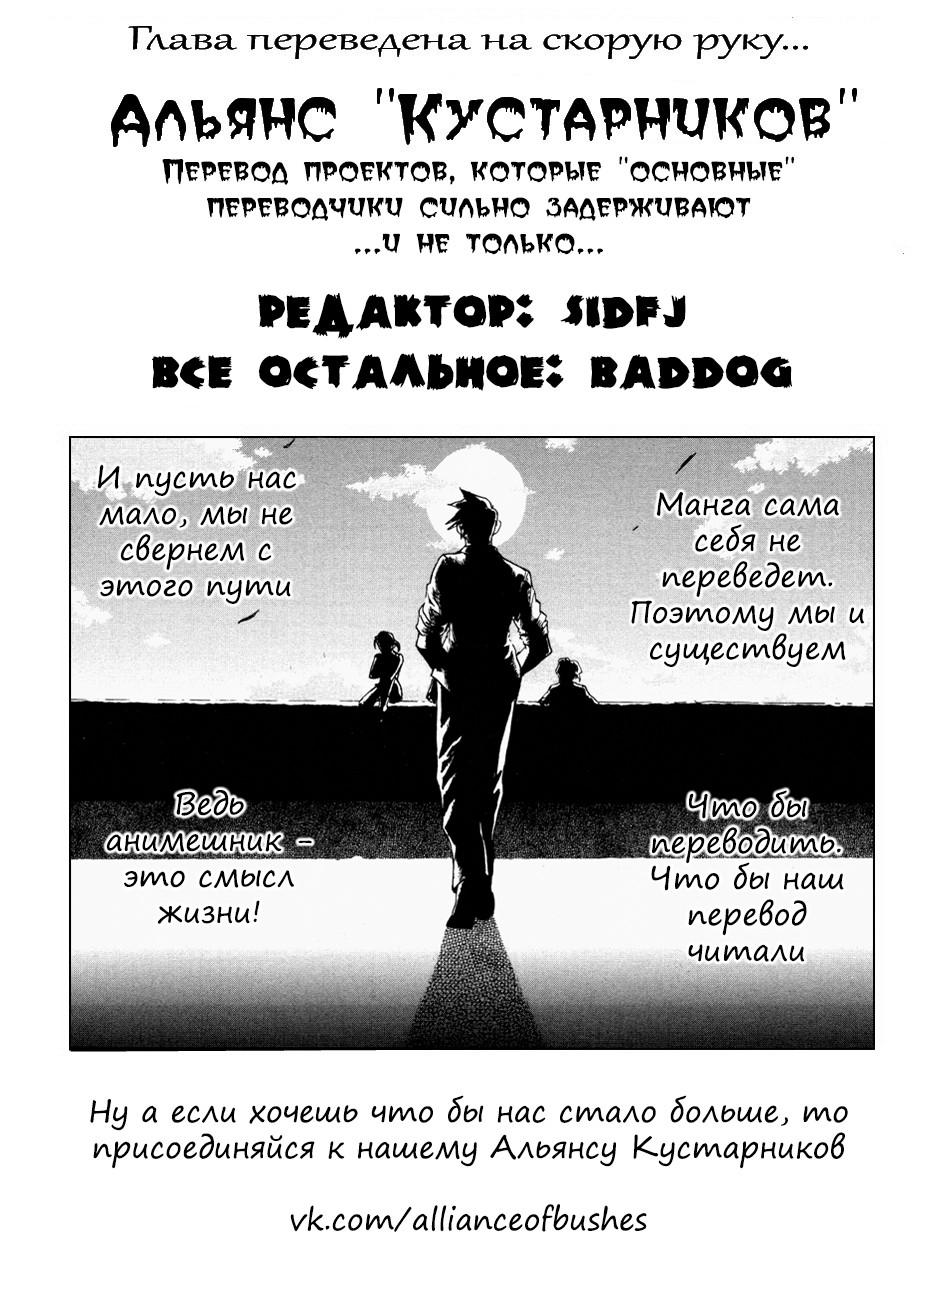 https://r1.ninemanga.com/comics/pic2/59/32507/416468/1533018853906.jpg Page 1